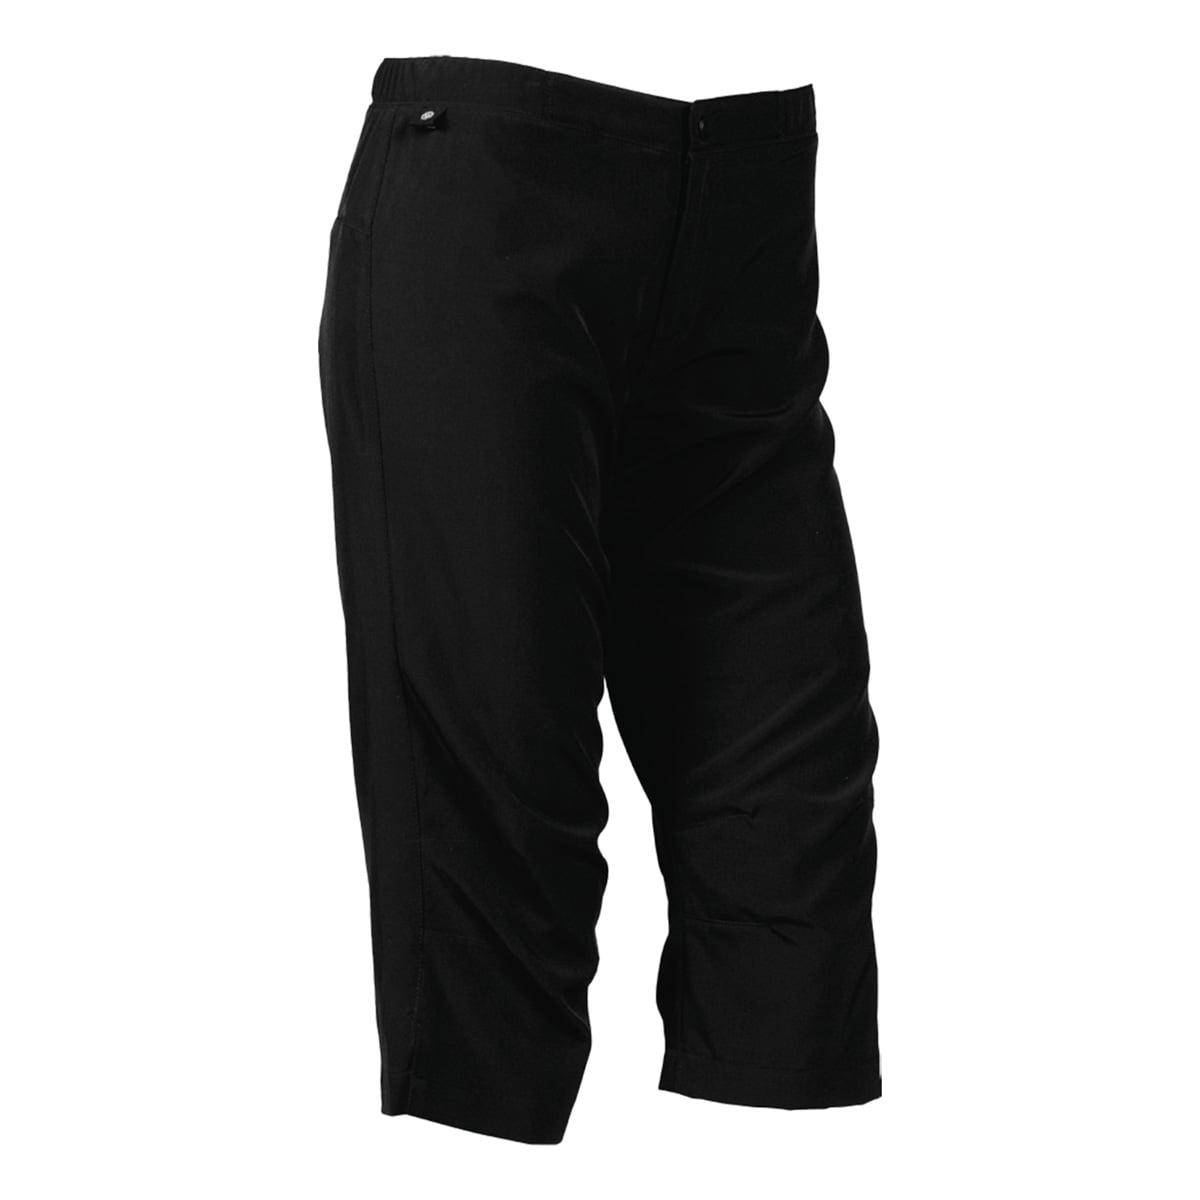 Canari Cyclewear 2015 16 Women's Rainer Knicker 2082 (Black XL) by Canari Cyclewear